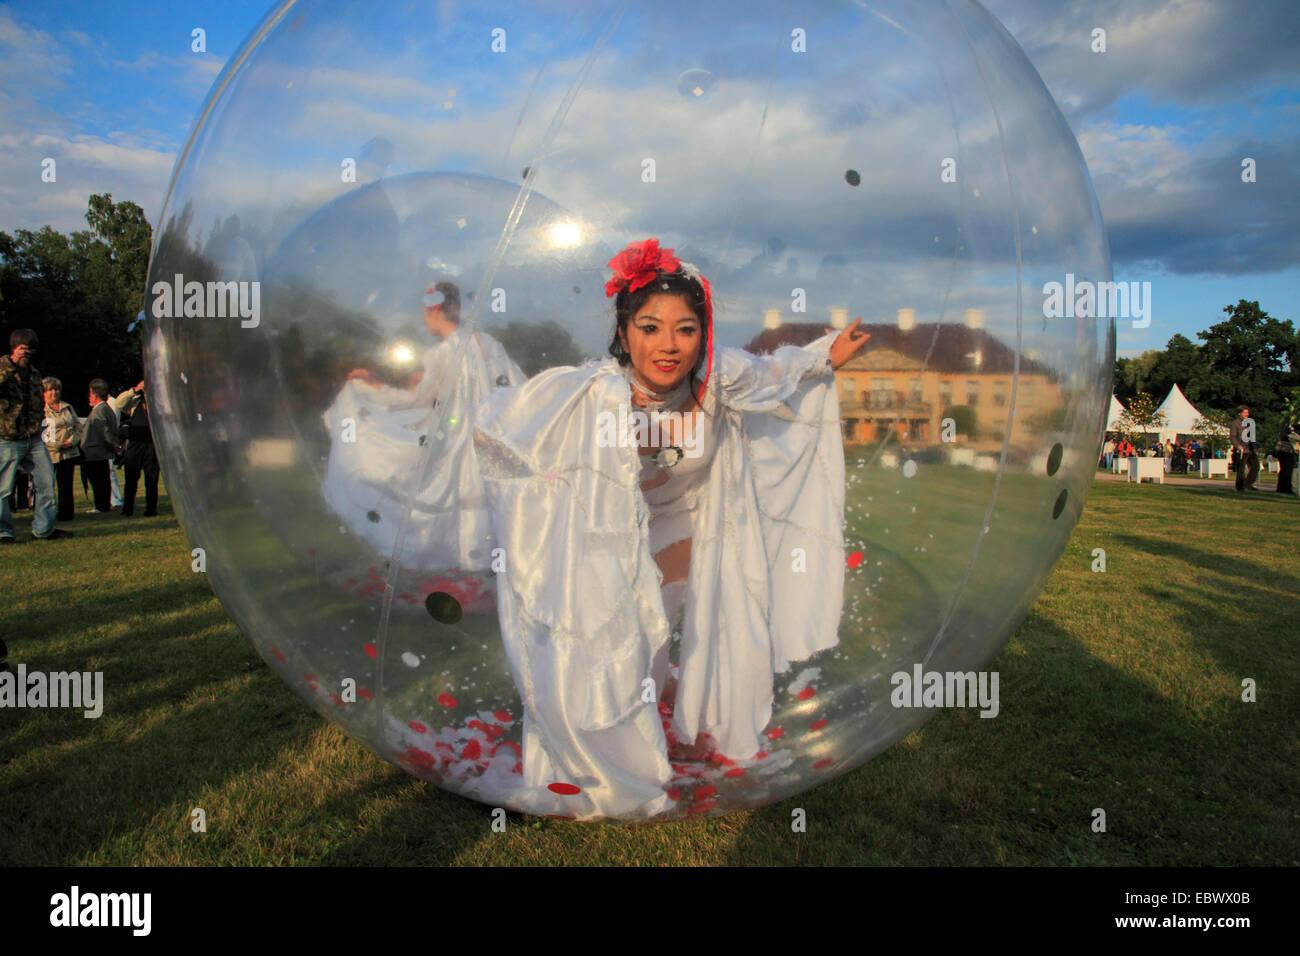 female dancer in a lucent ball at festival, Oranienbaum Palace, Germany, Saxony-Anhalt, Oranienbaum - Stock Image